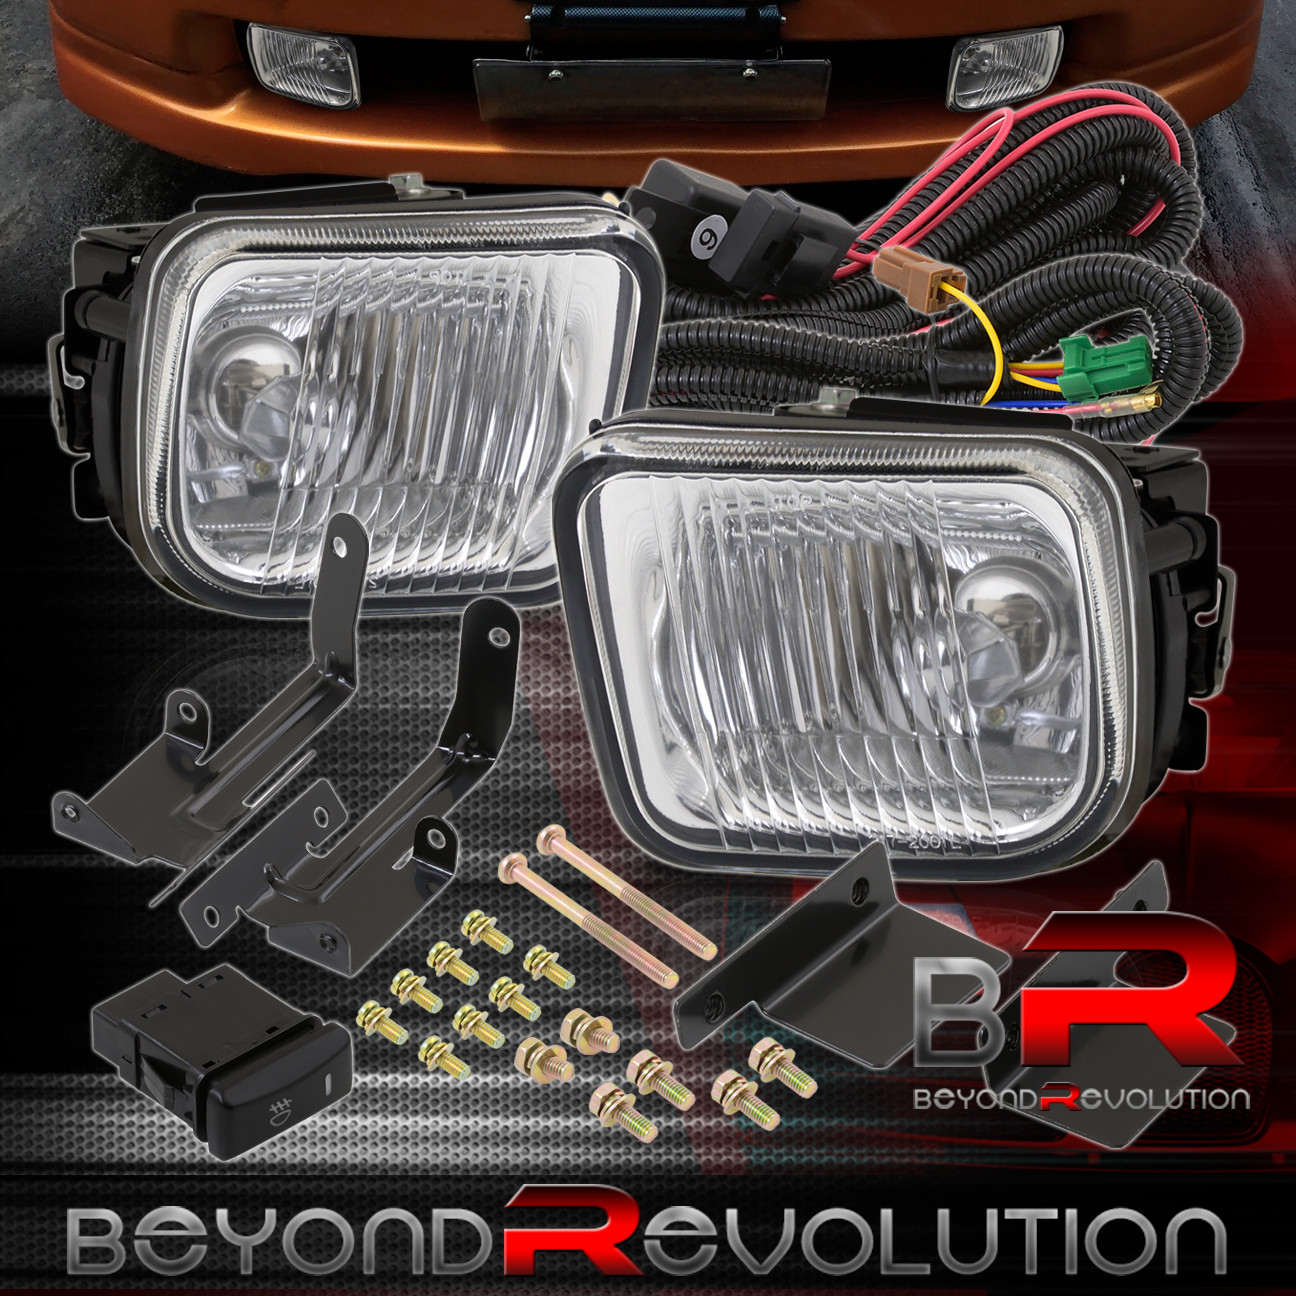 Honda Civic Lx Dx Ex Clear Lens Glass Fog Lights W Wiring Harness 96